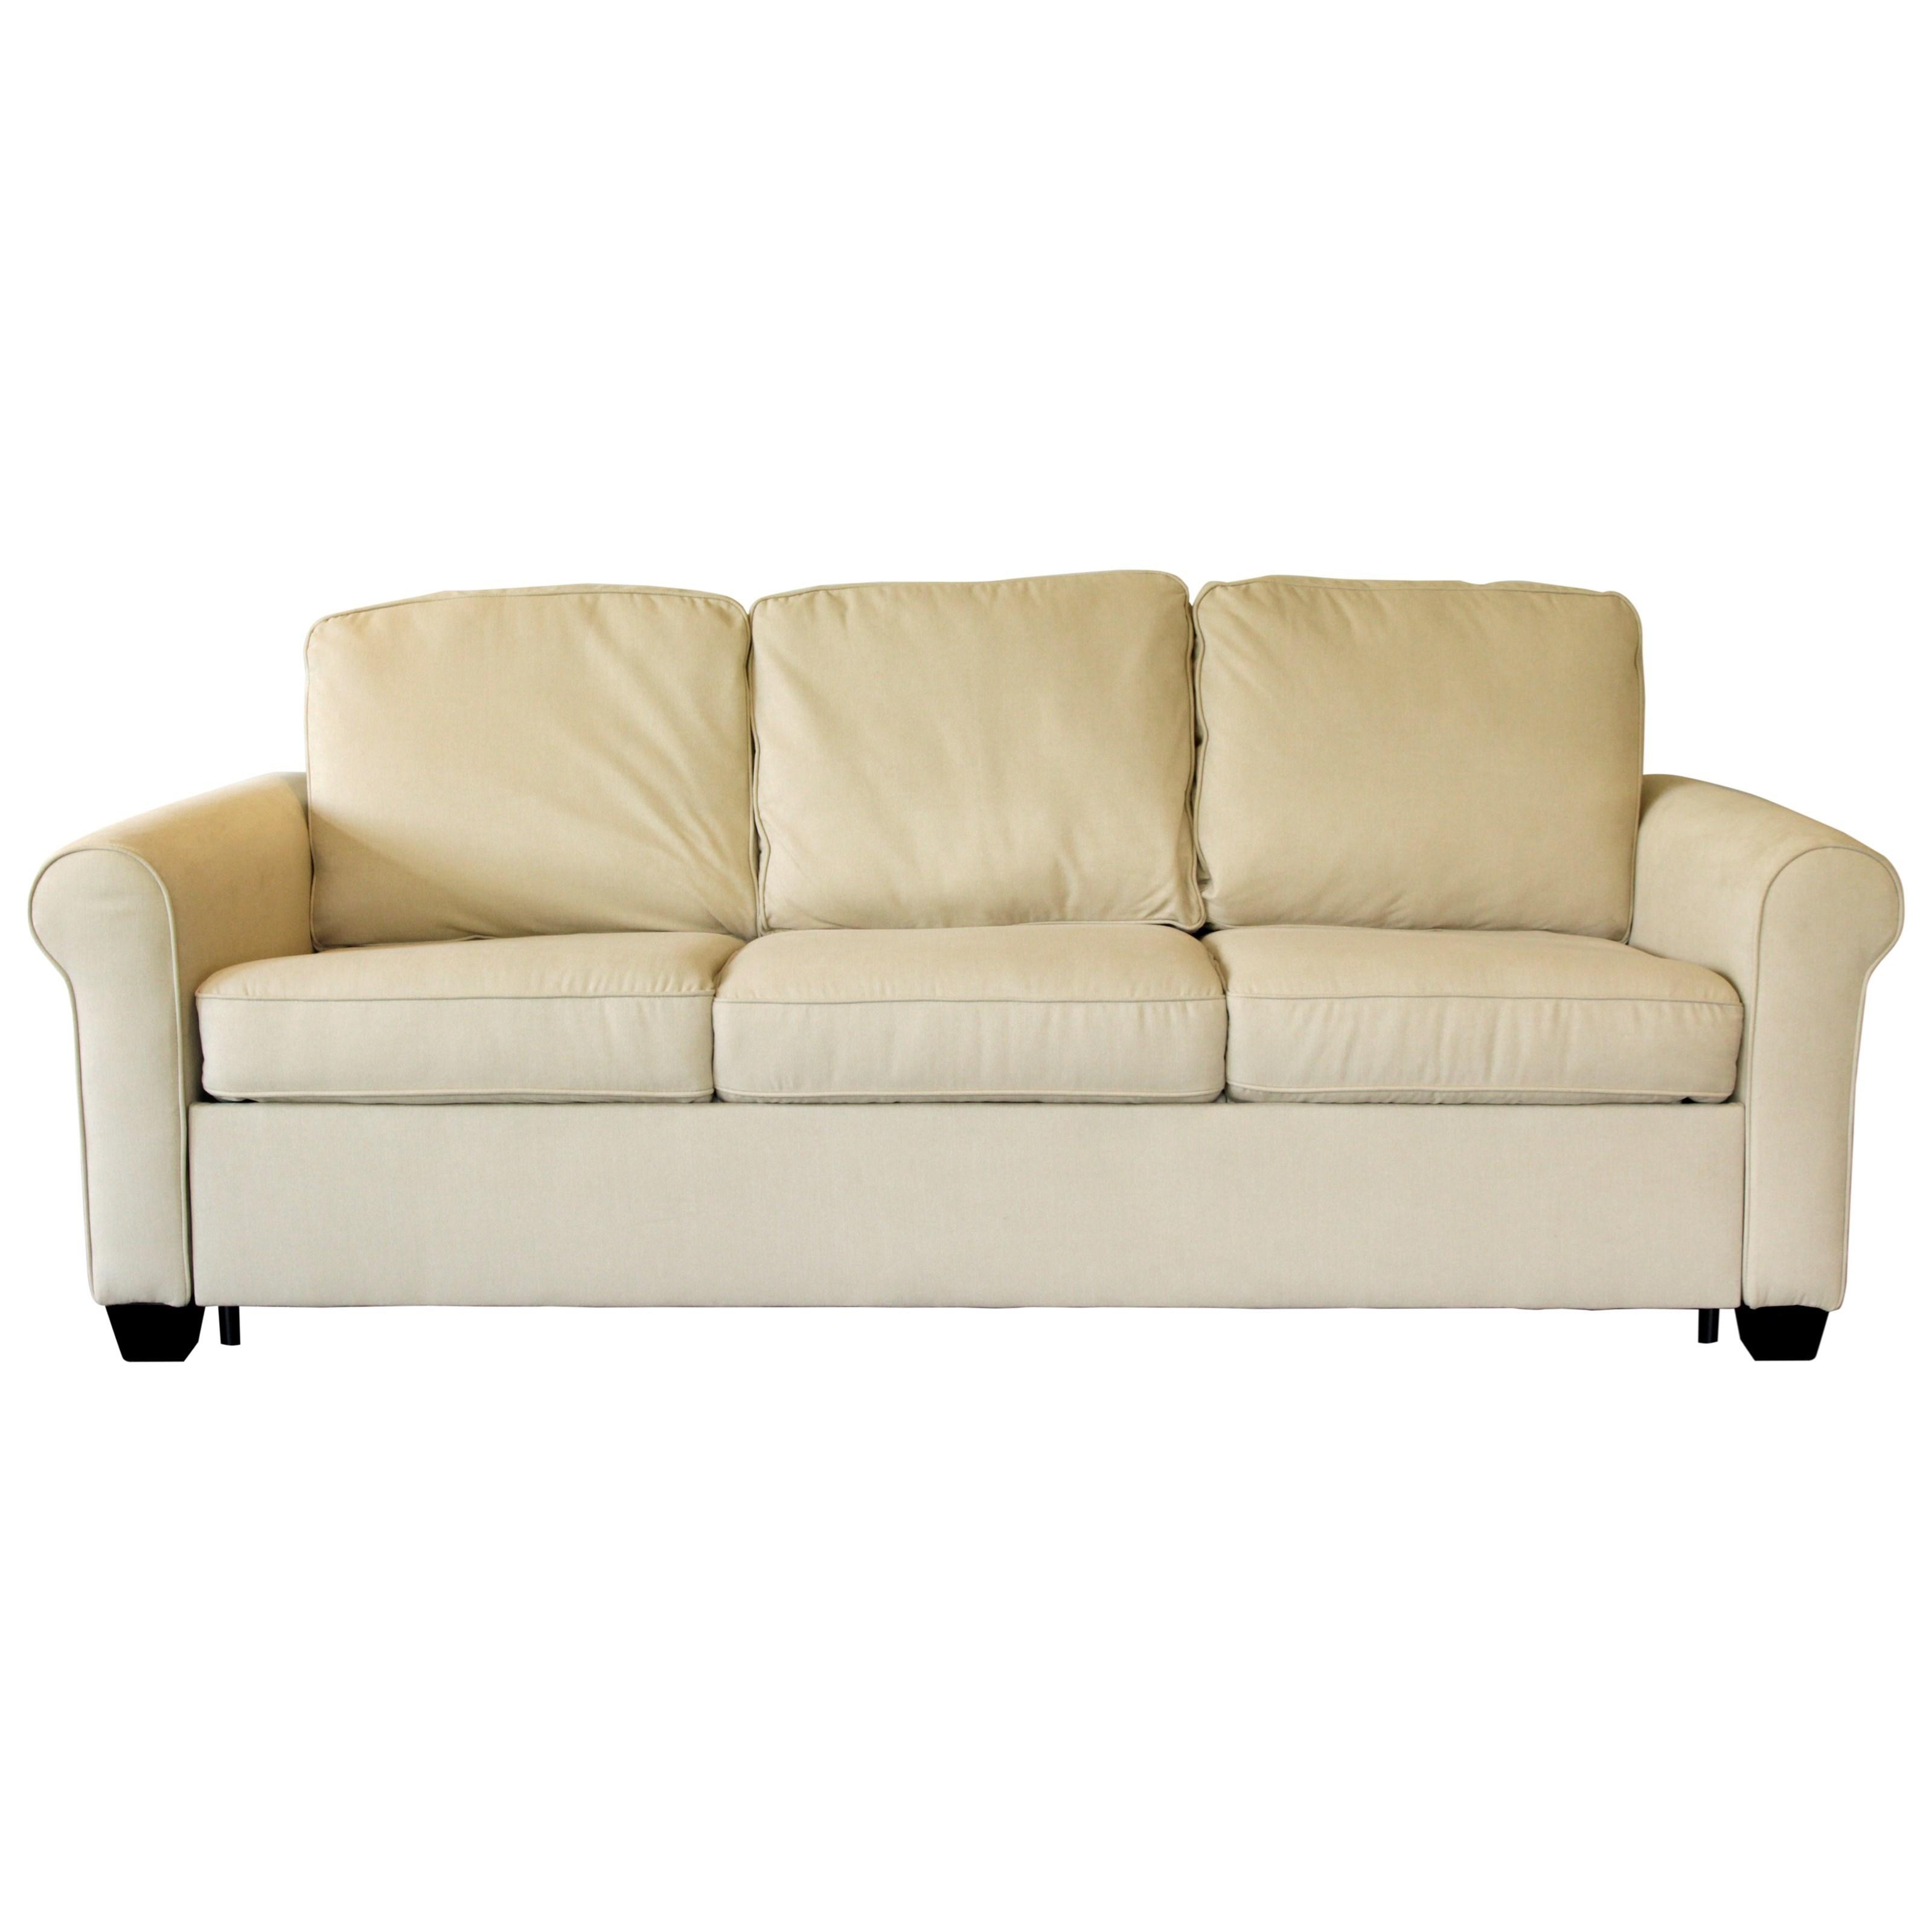 Swinden Double Sofa Sleeper by Palliser at Fine Home Furnishings